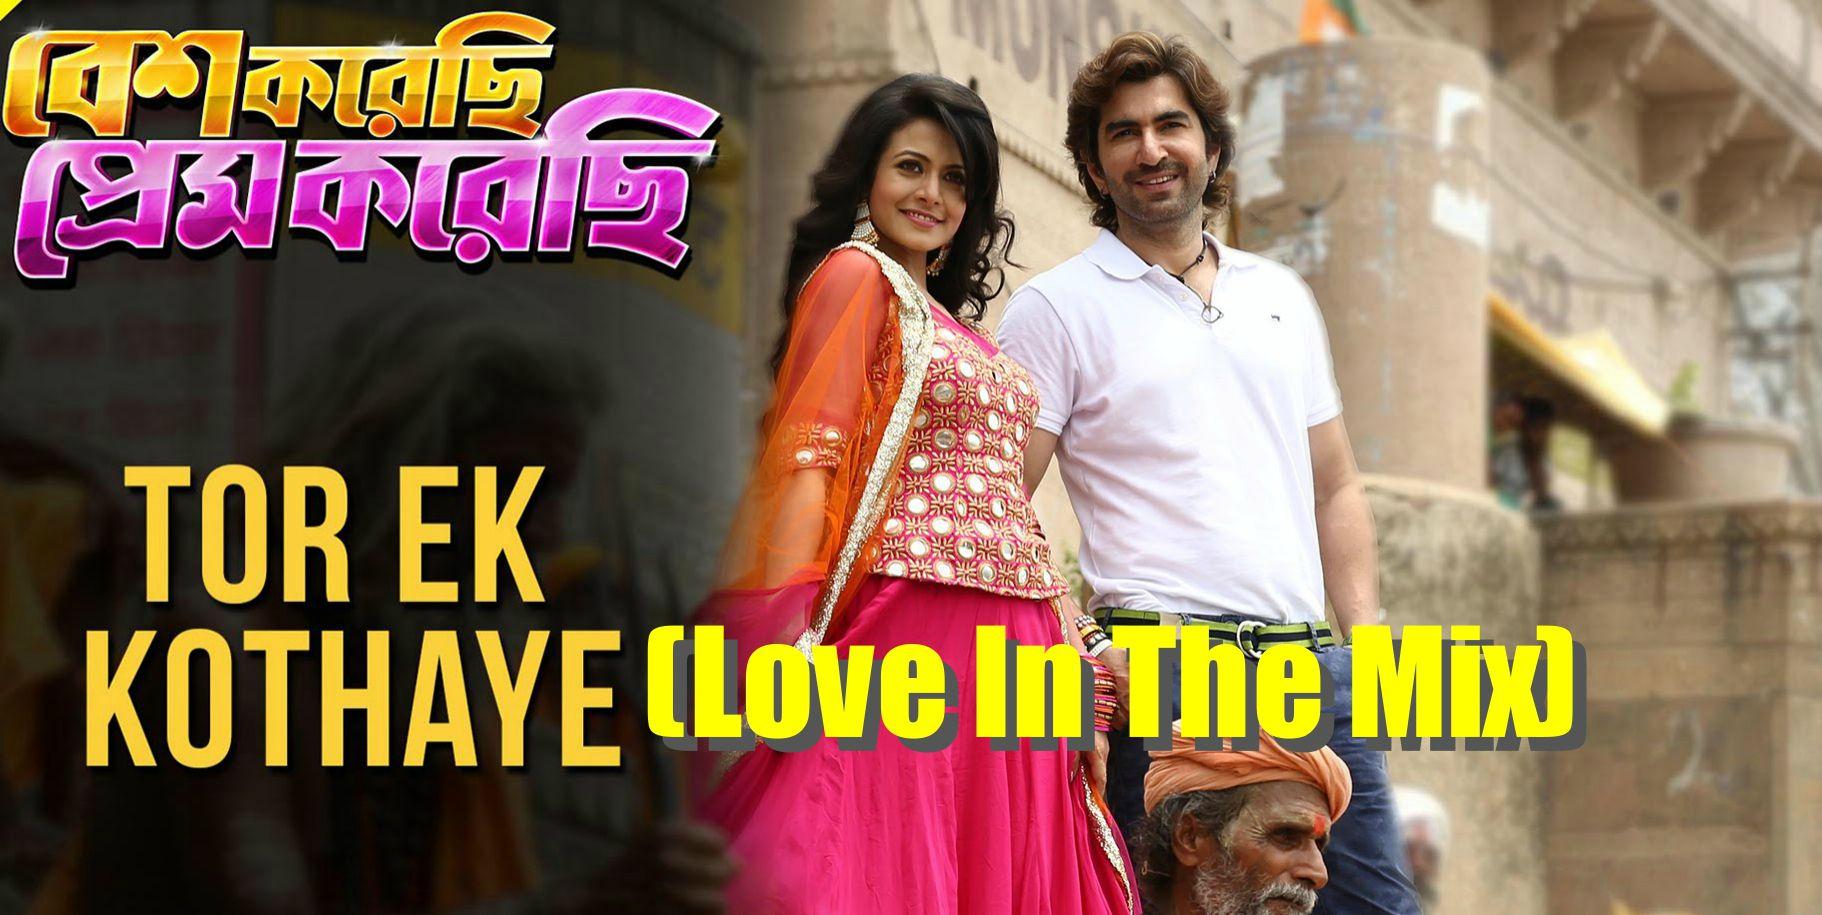 Tor Ek Kothay (Love In The Mix) By Dj LikhoN & Dj RipoN Full Mp3 Download